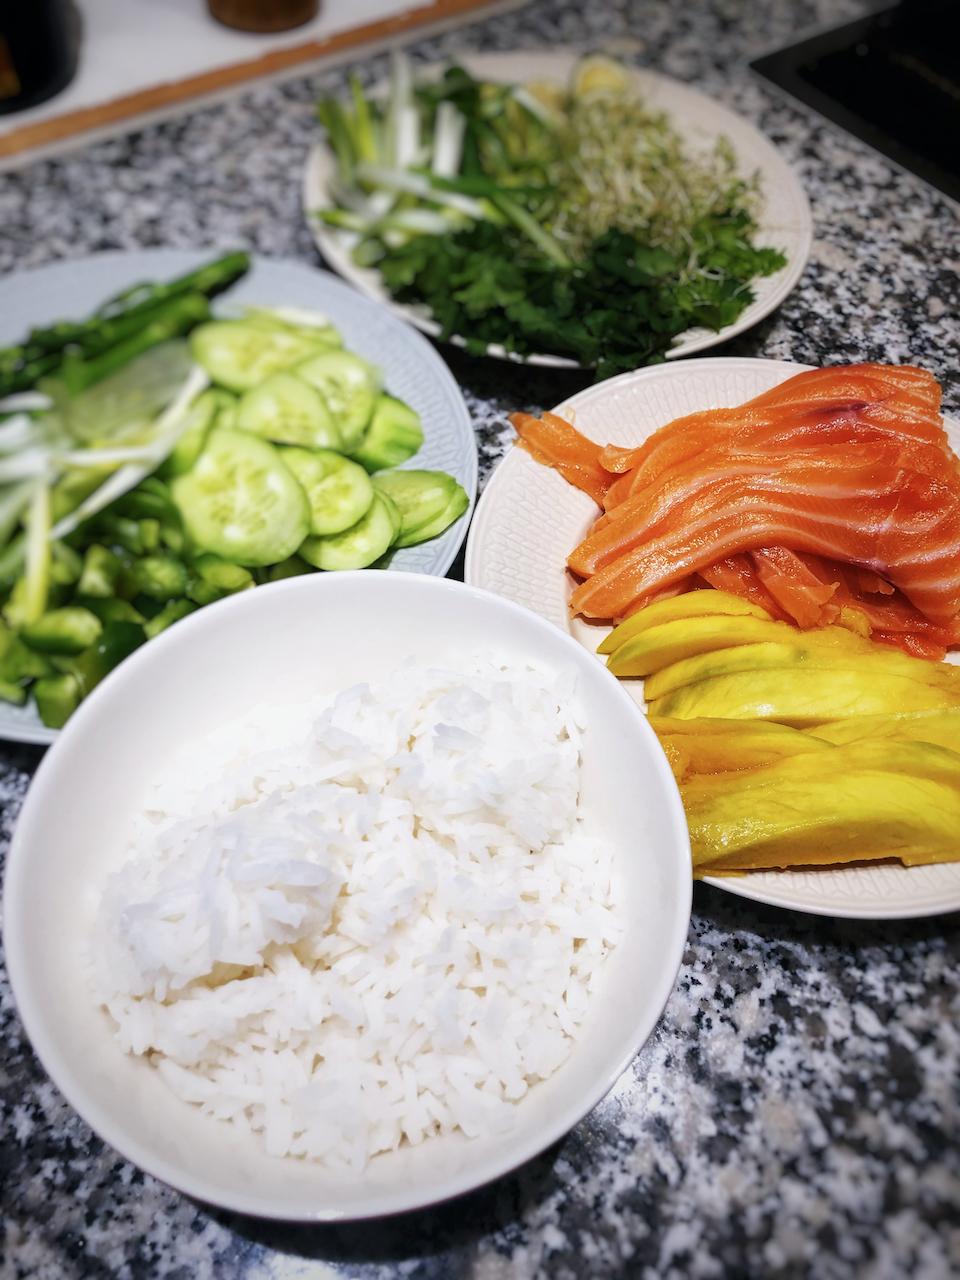 Poké bowl ingredients